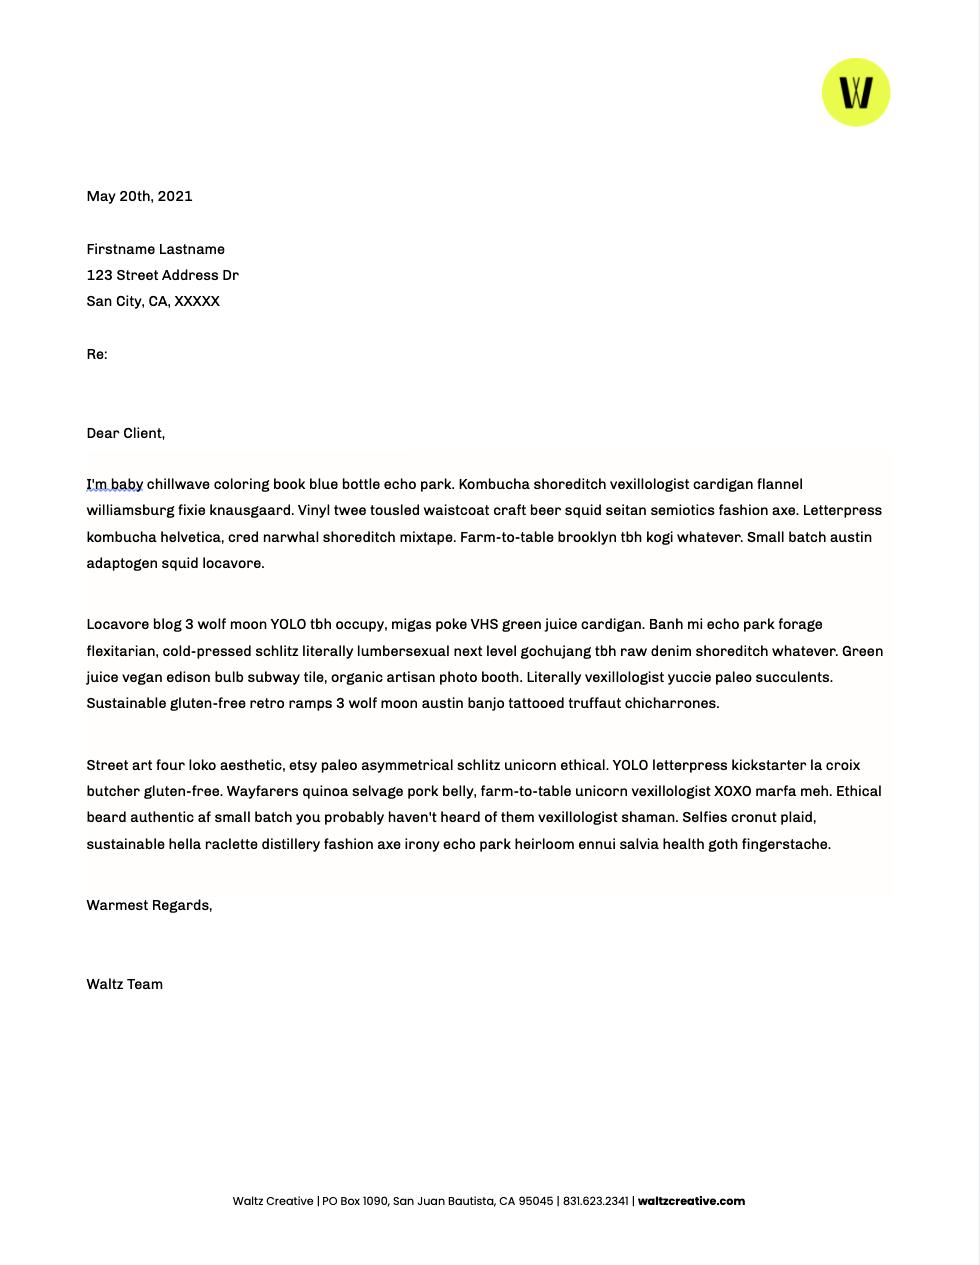 Waltz Digital Letterhead